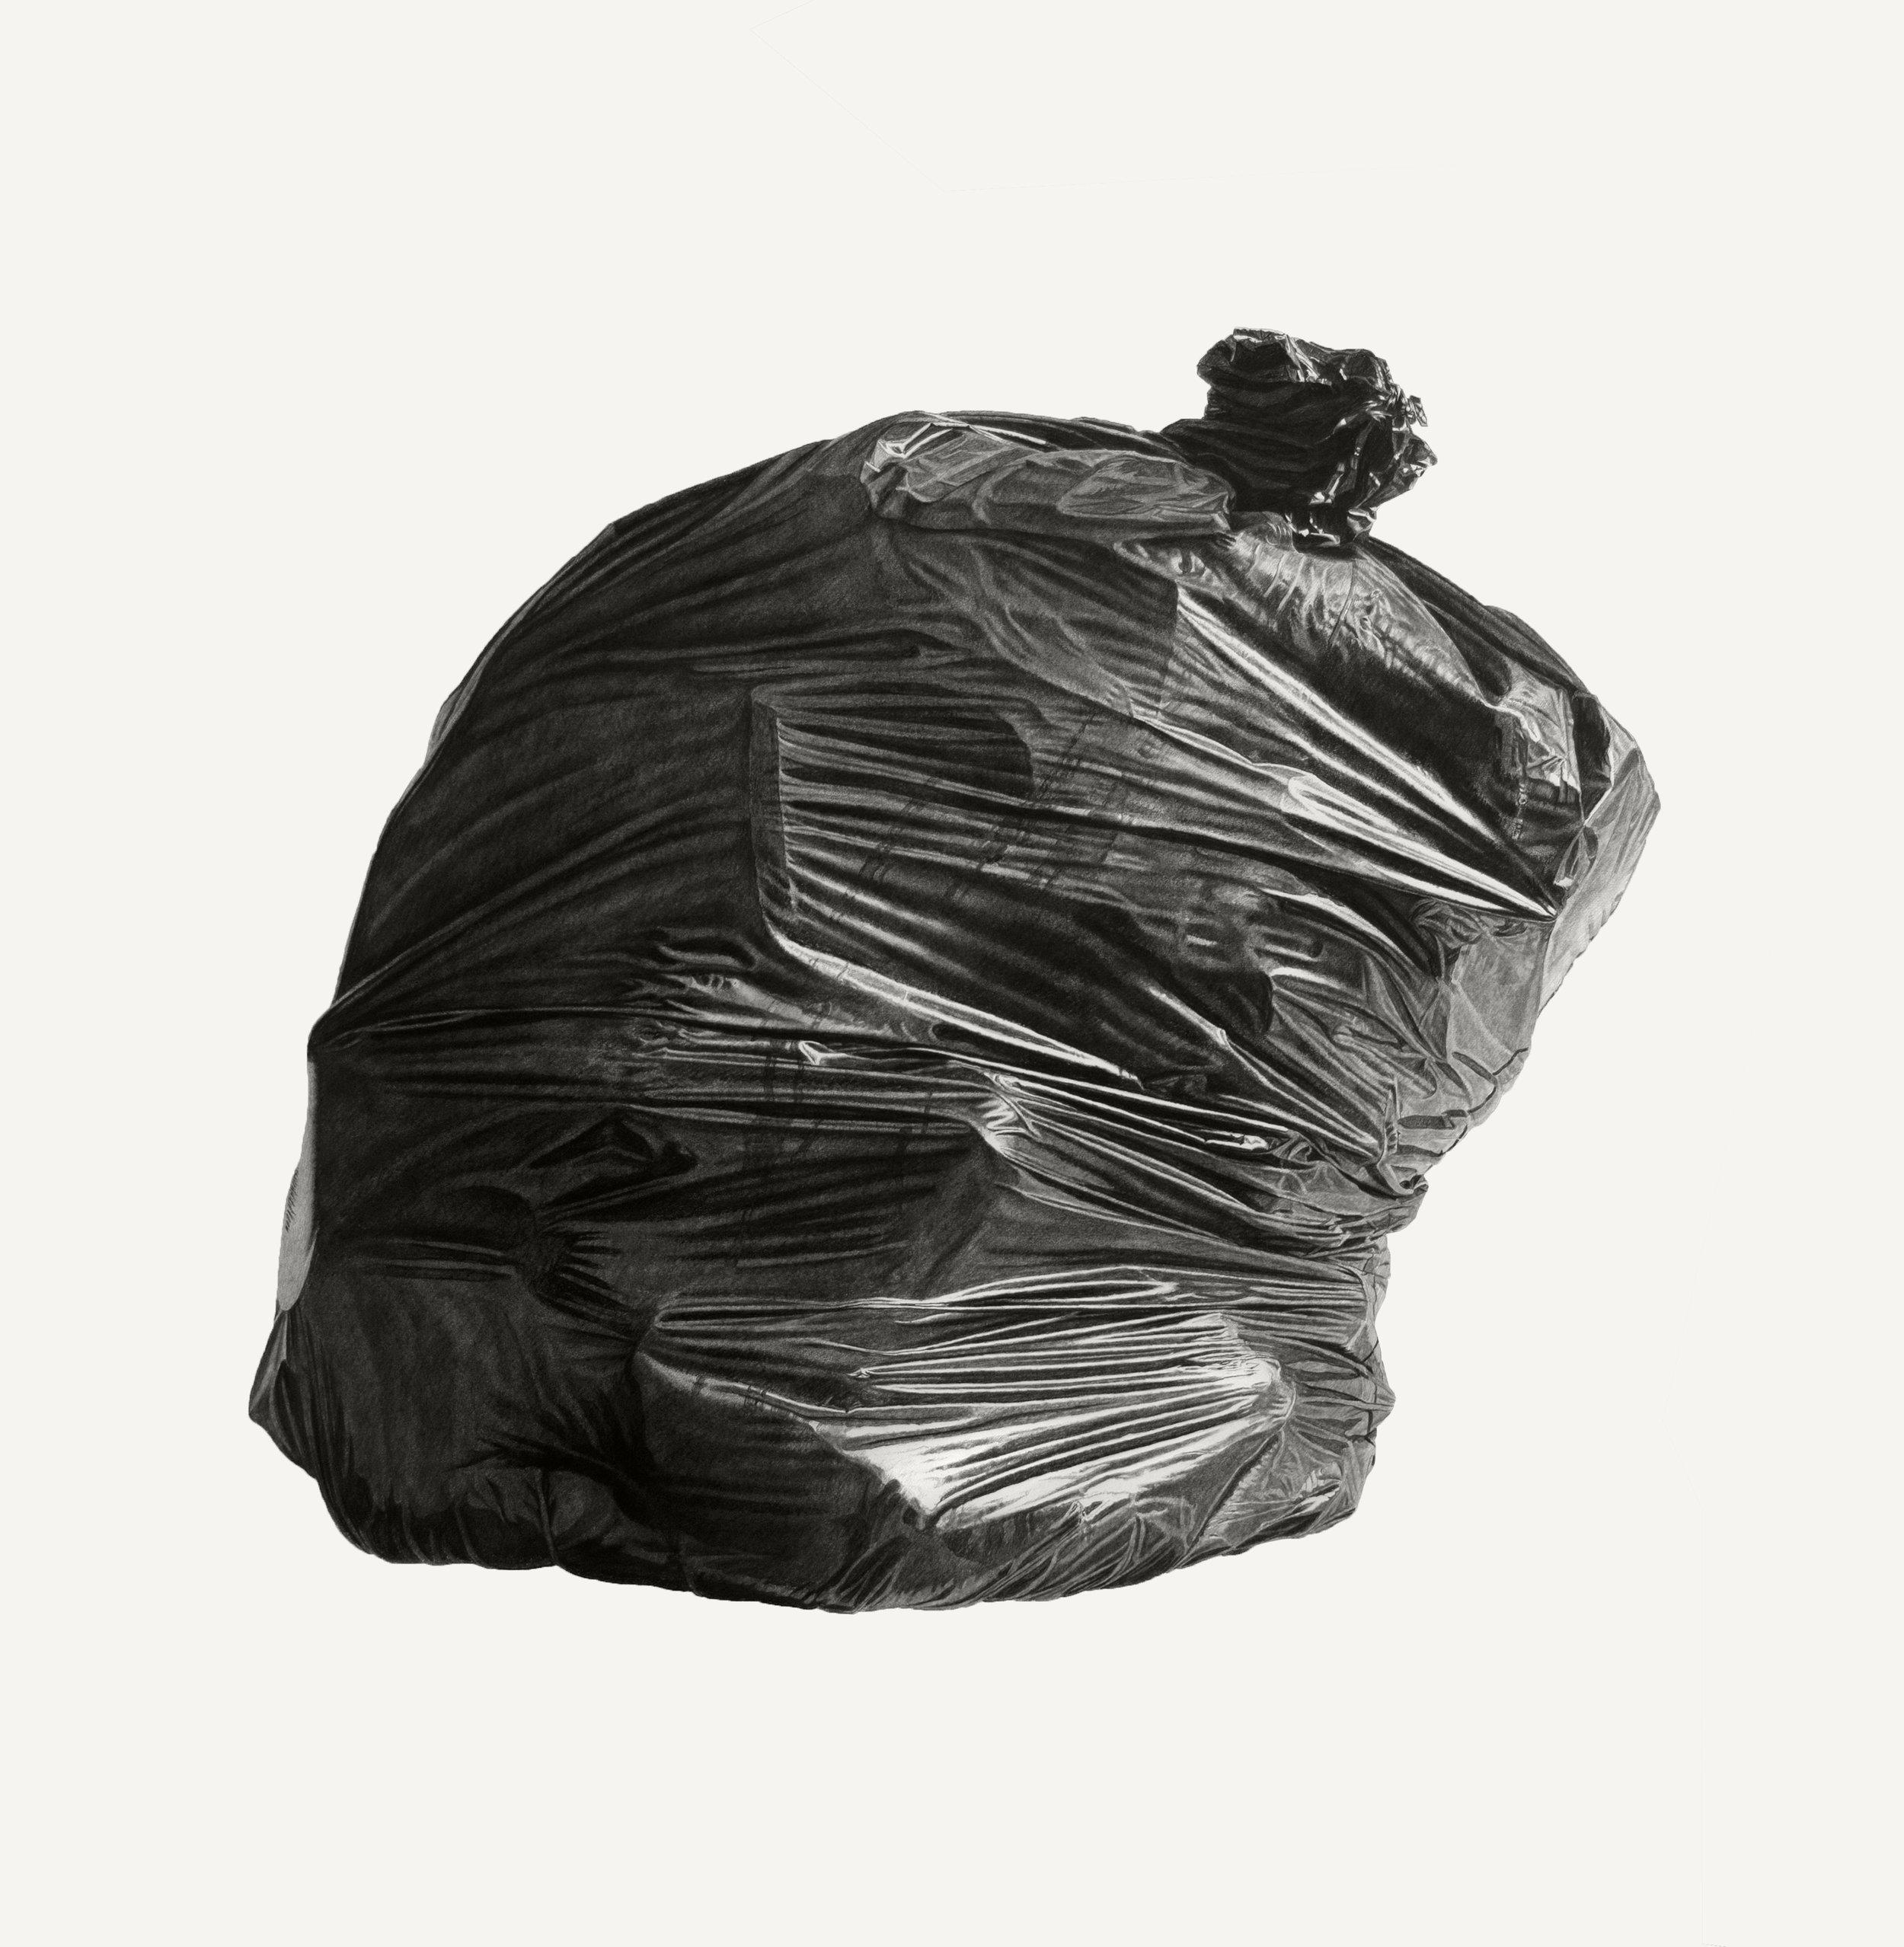 Neighborhood Still Life #8 (Black Bag)